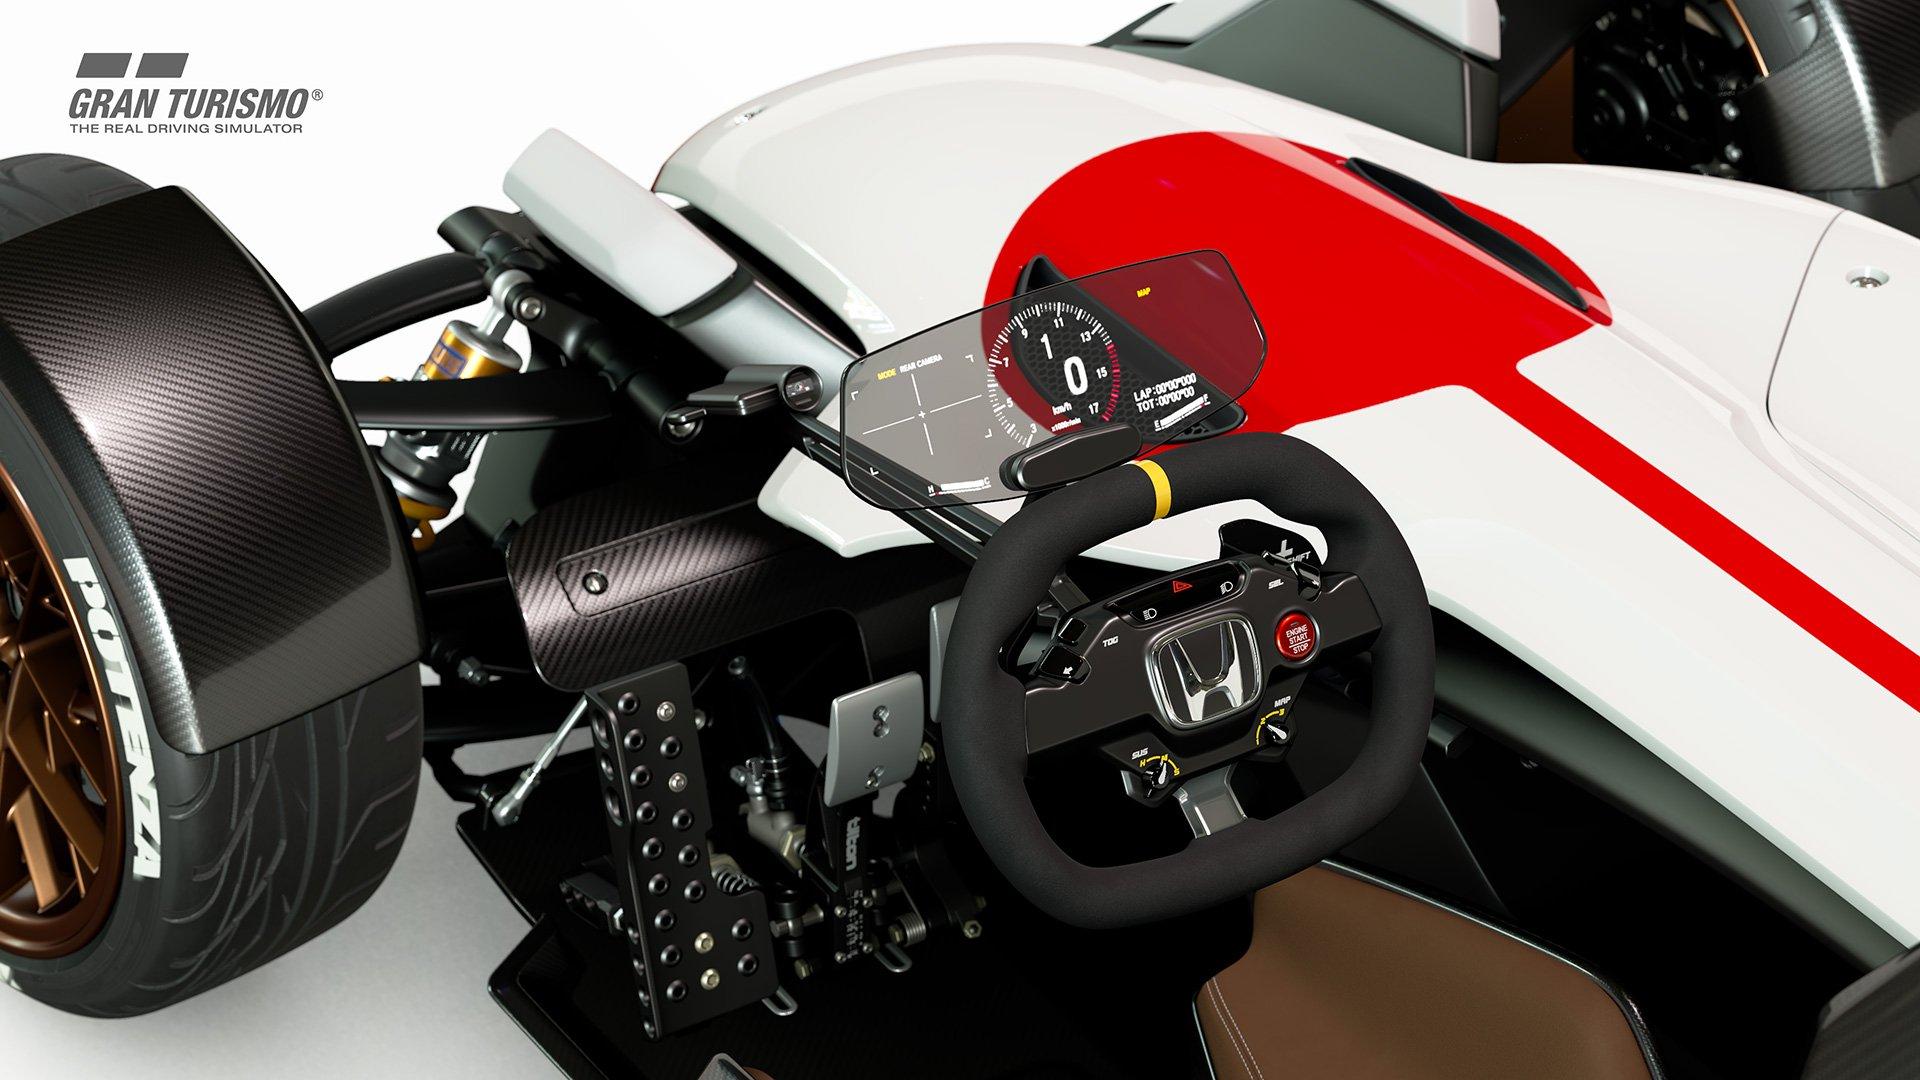 Gran Turismo Sport Honda Vision Gran Turismo interior